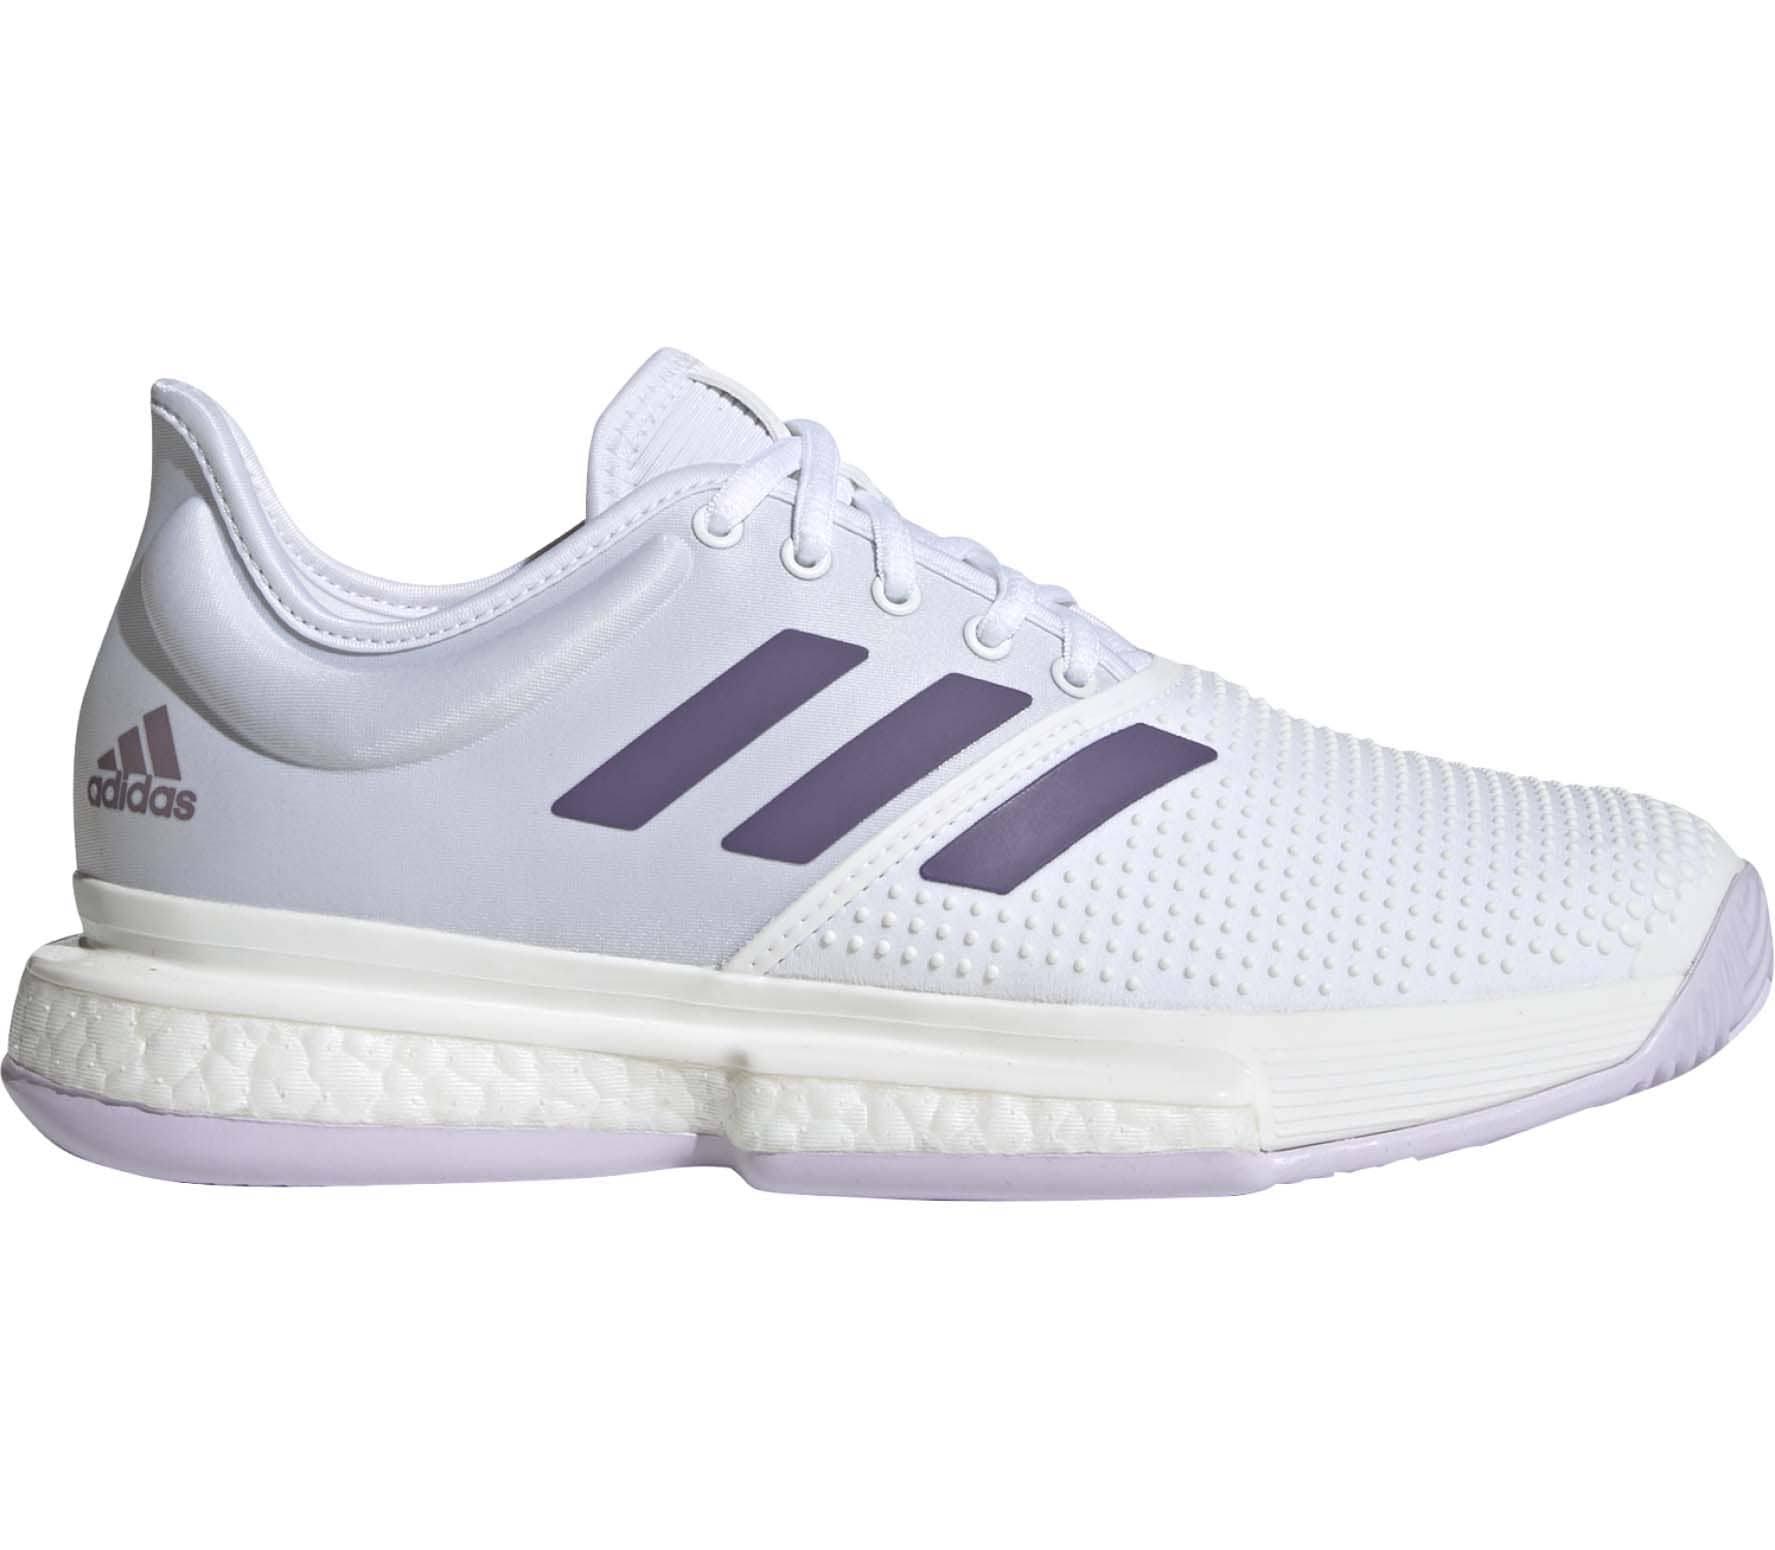 Adidas SoleCourt Women Tennis Shoes White